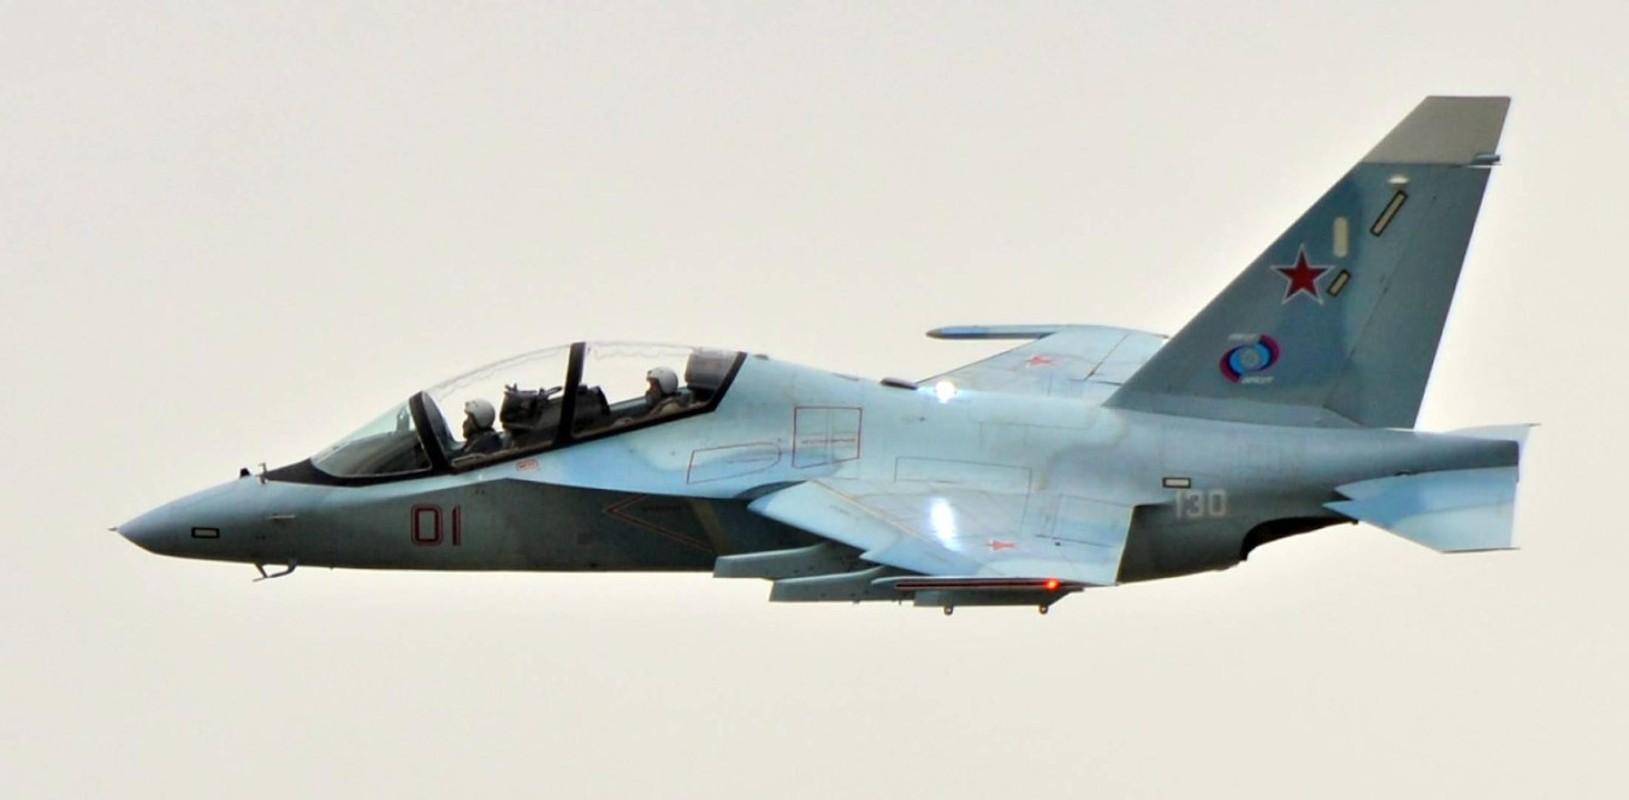 Hai quan Nga nhan hang loat Yak-130 de 'don' sieu tau san bay tuong lai?-Hinh-12